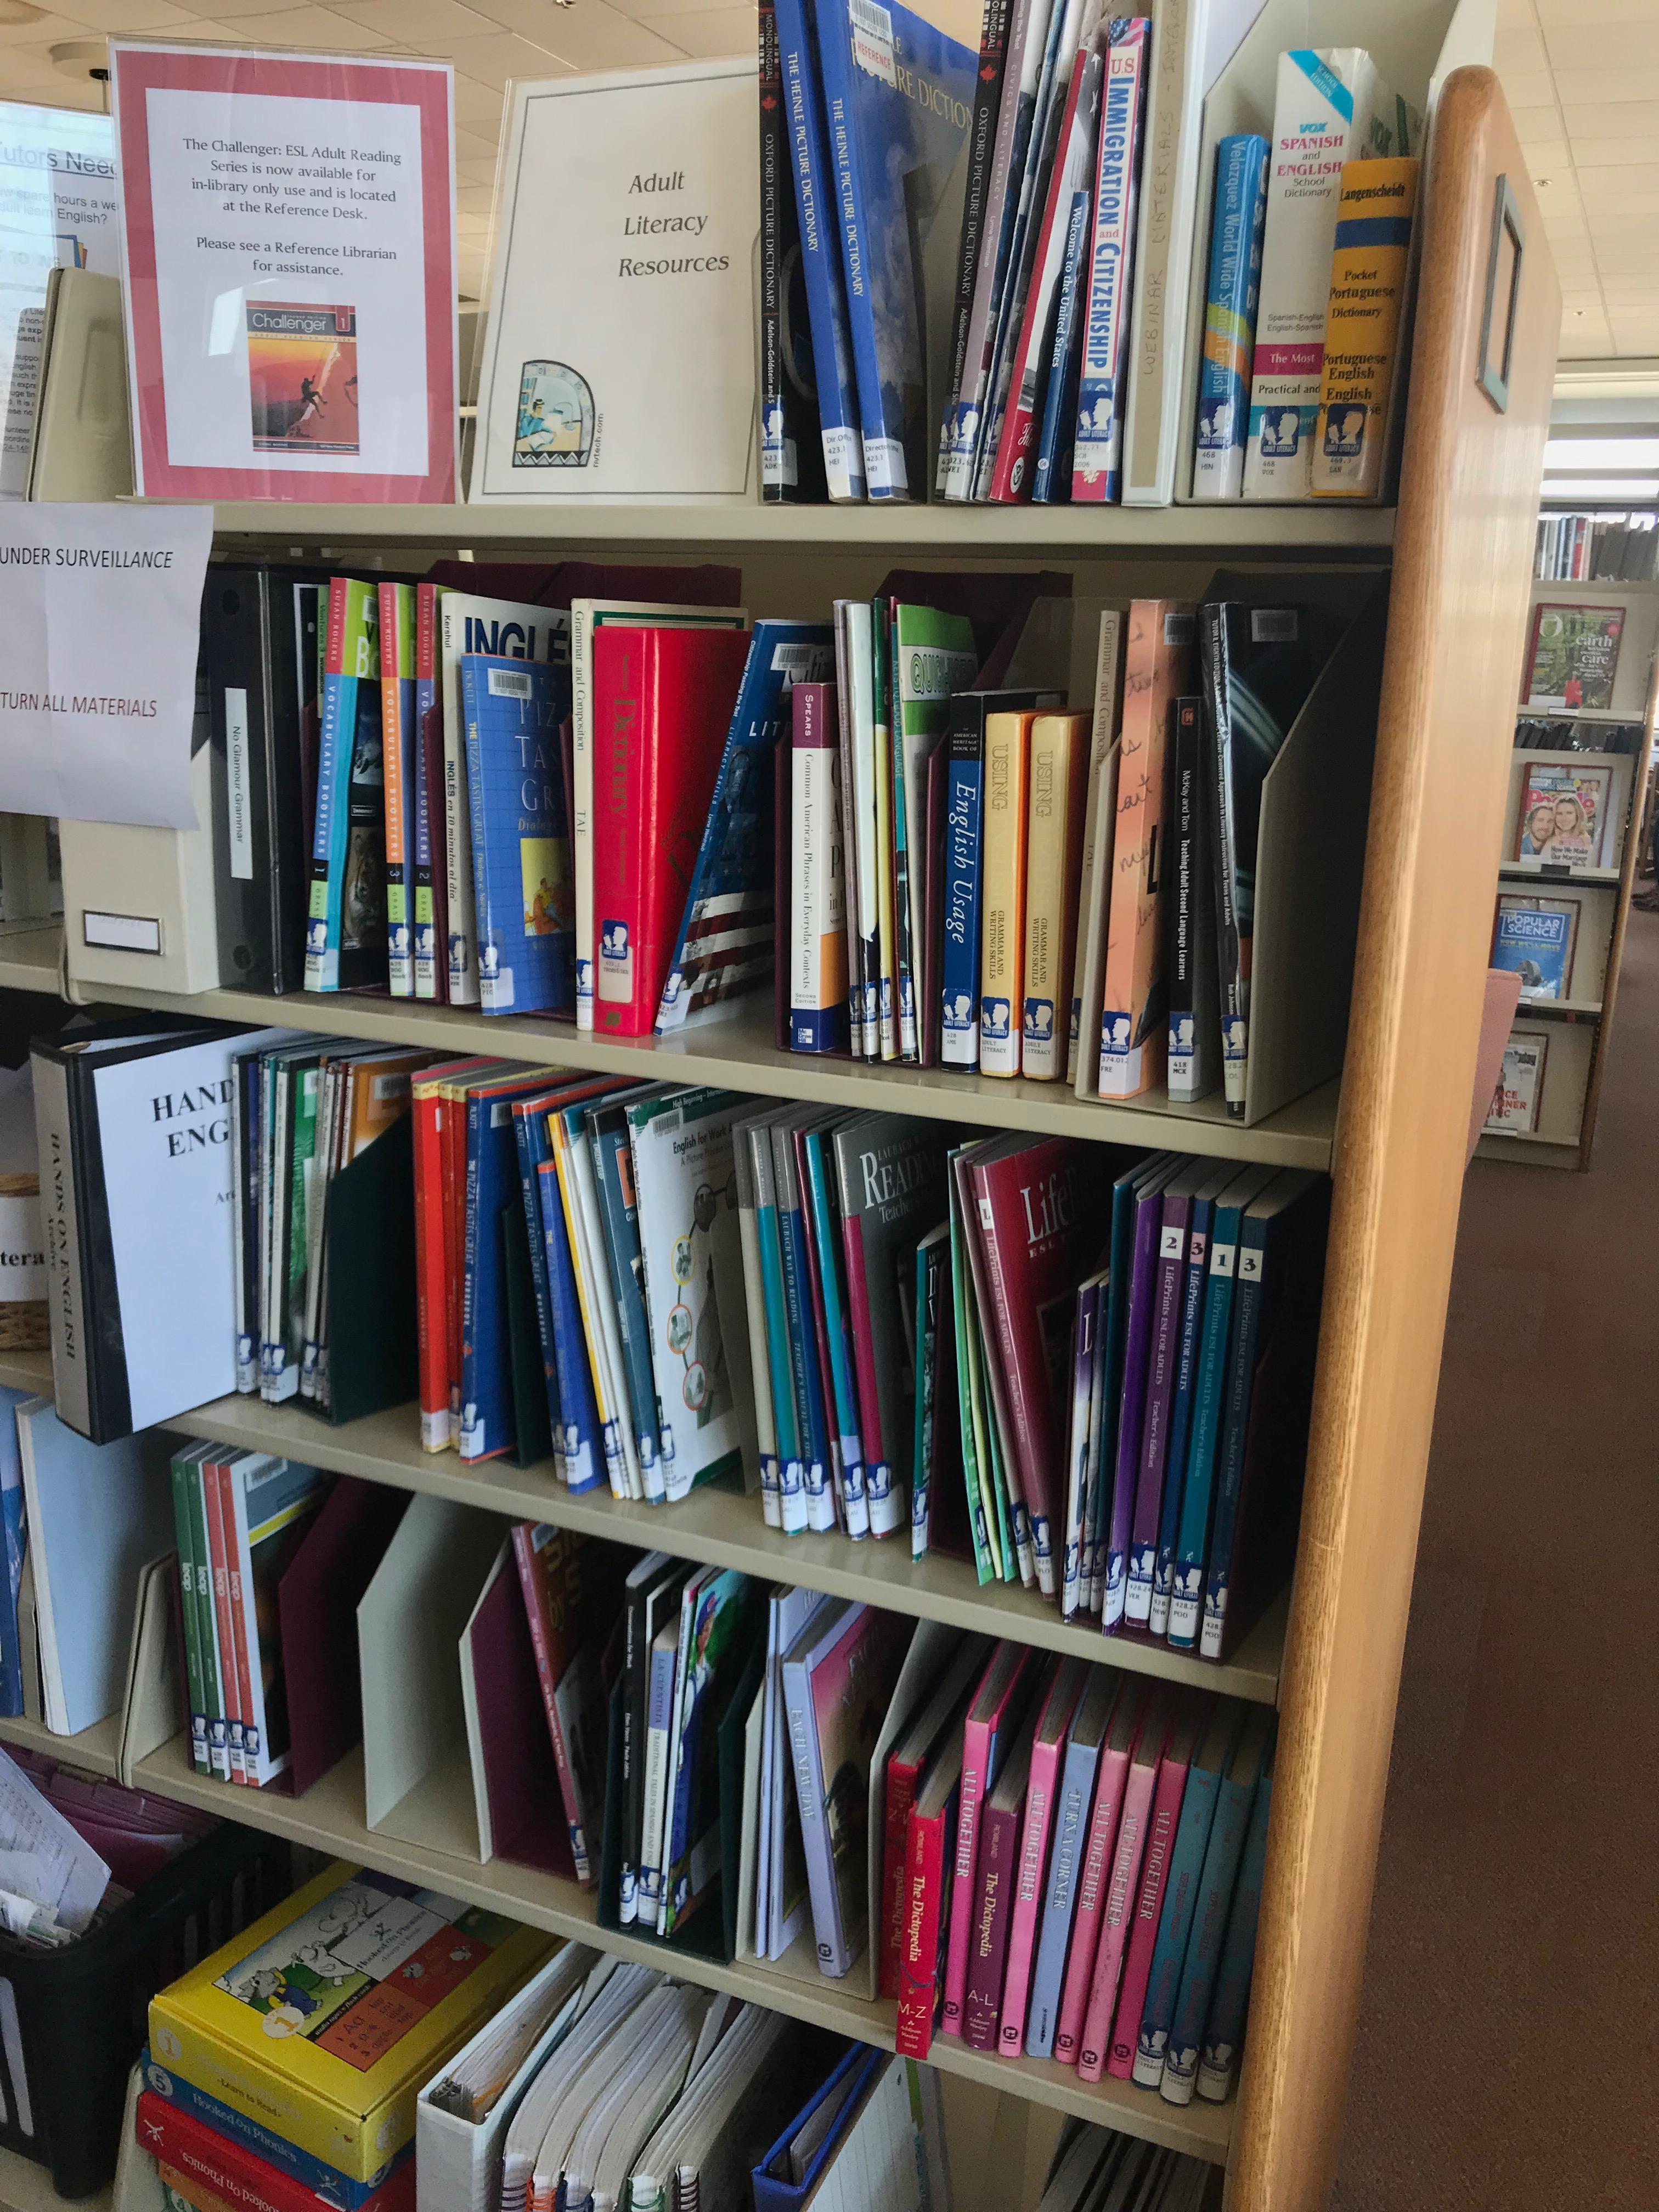 image of bookshelves featuring ESL study materials